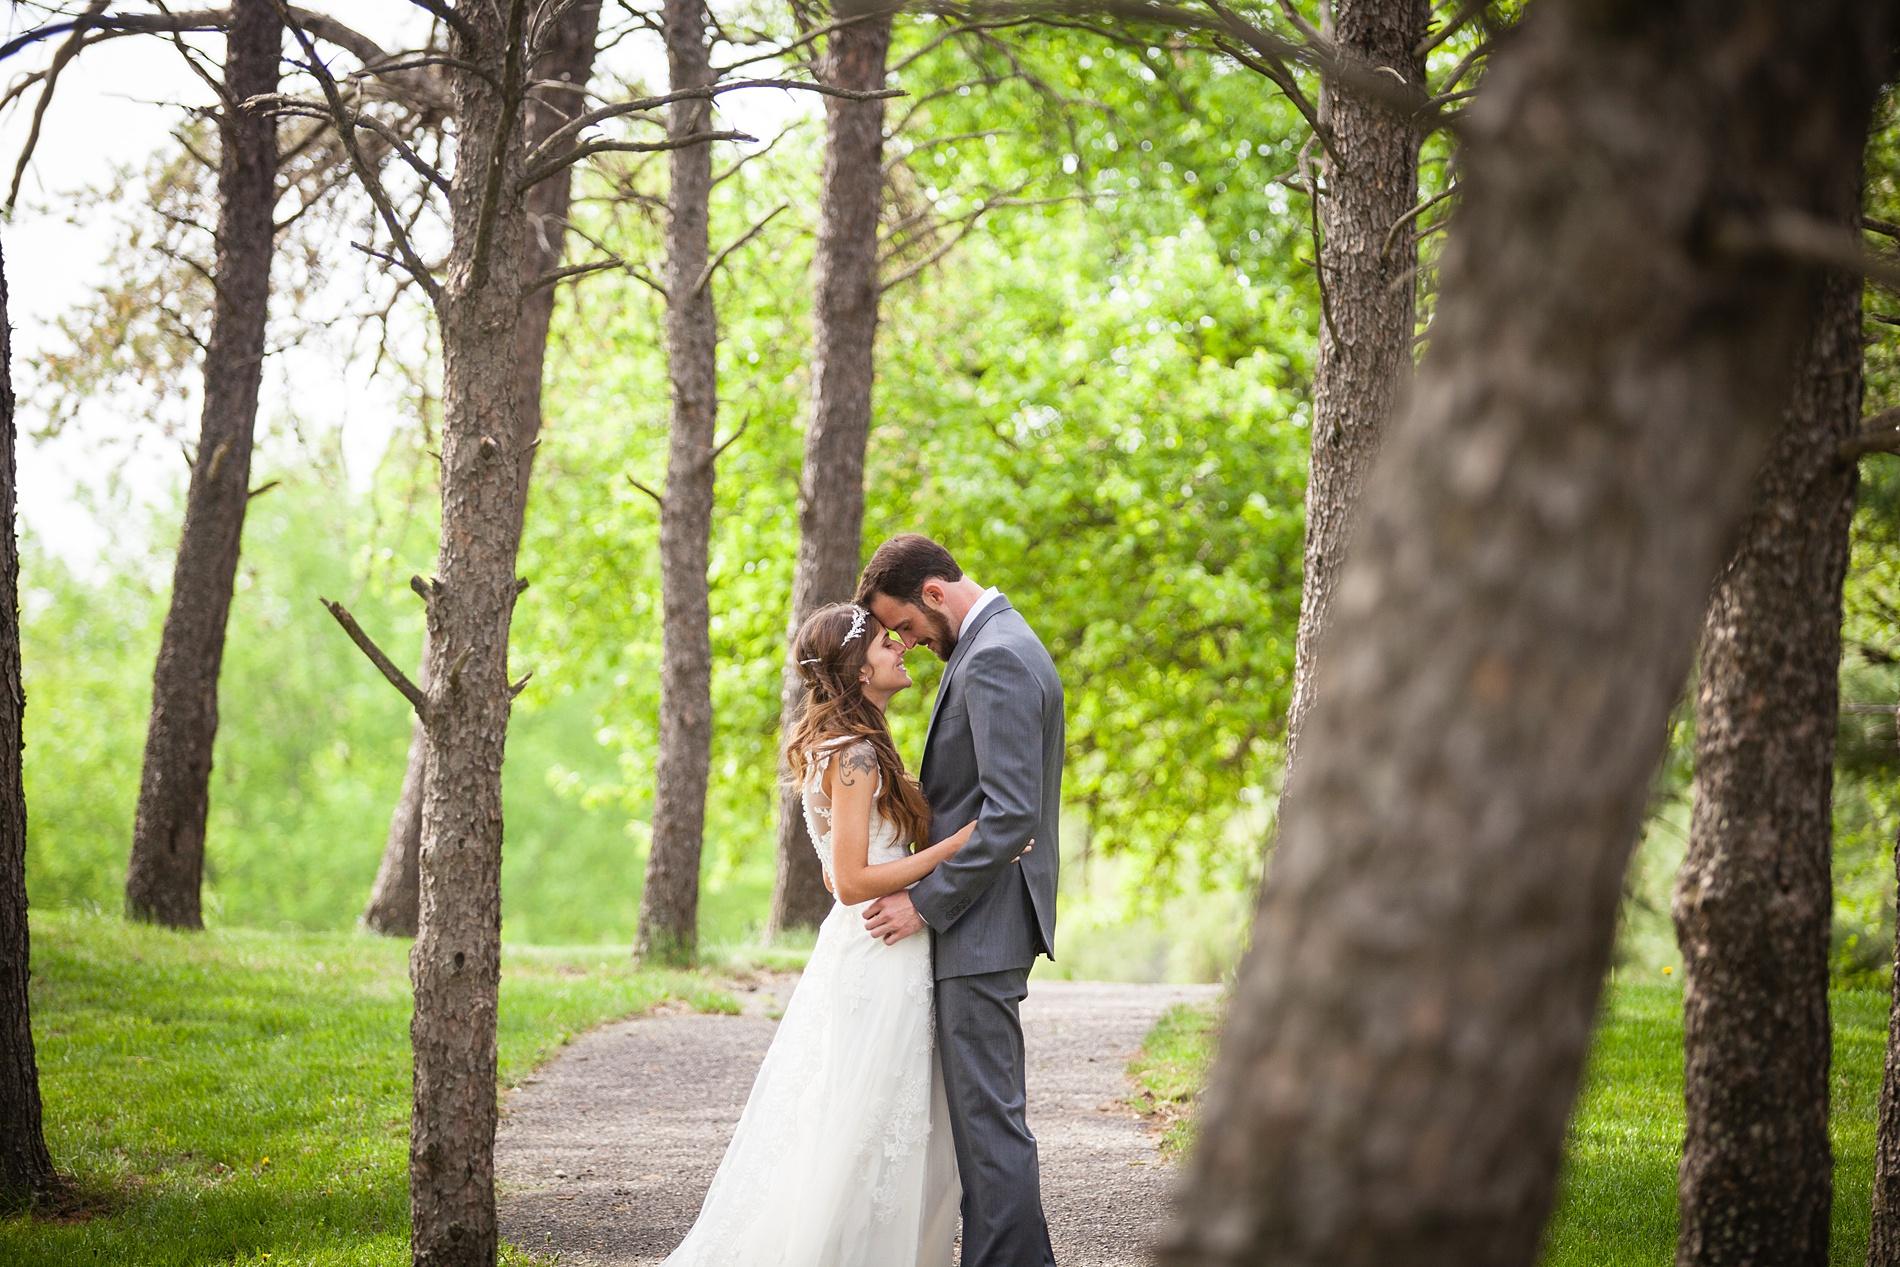 Brandon_Shafer_Photography_Brett_Autumn_Wedding_0033.jpg